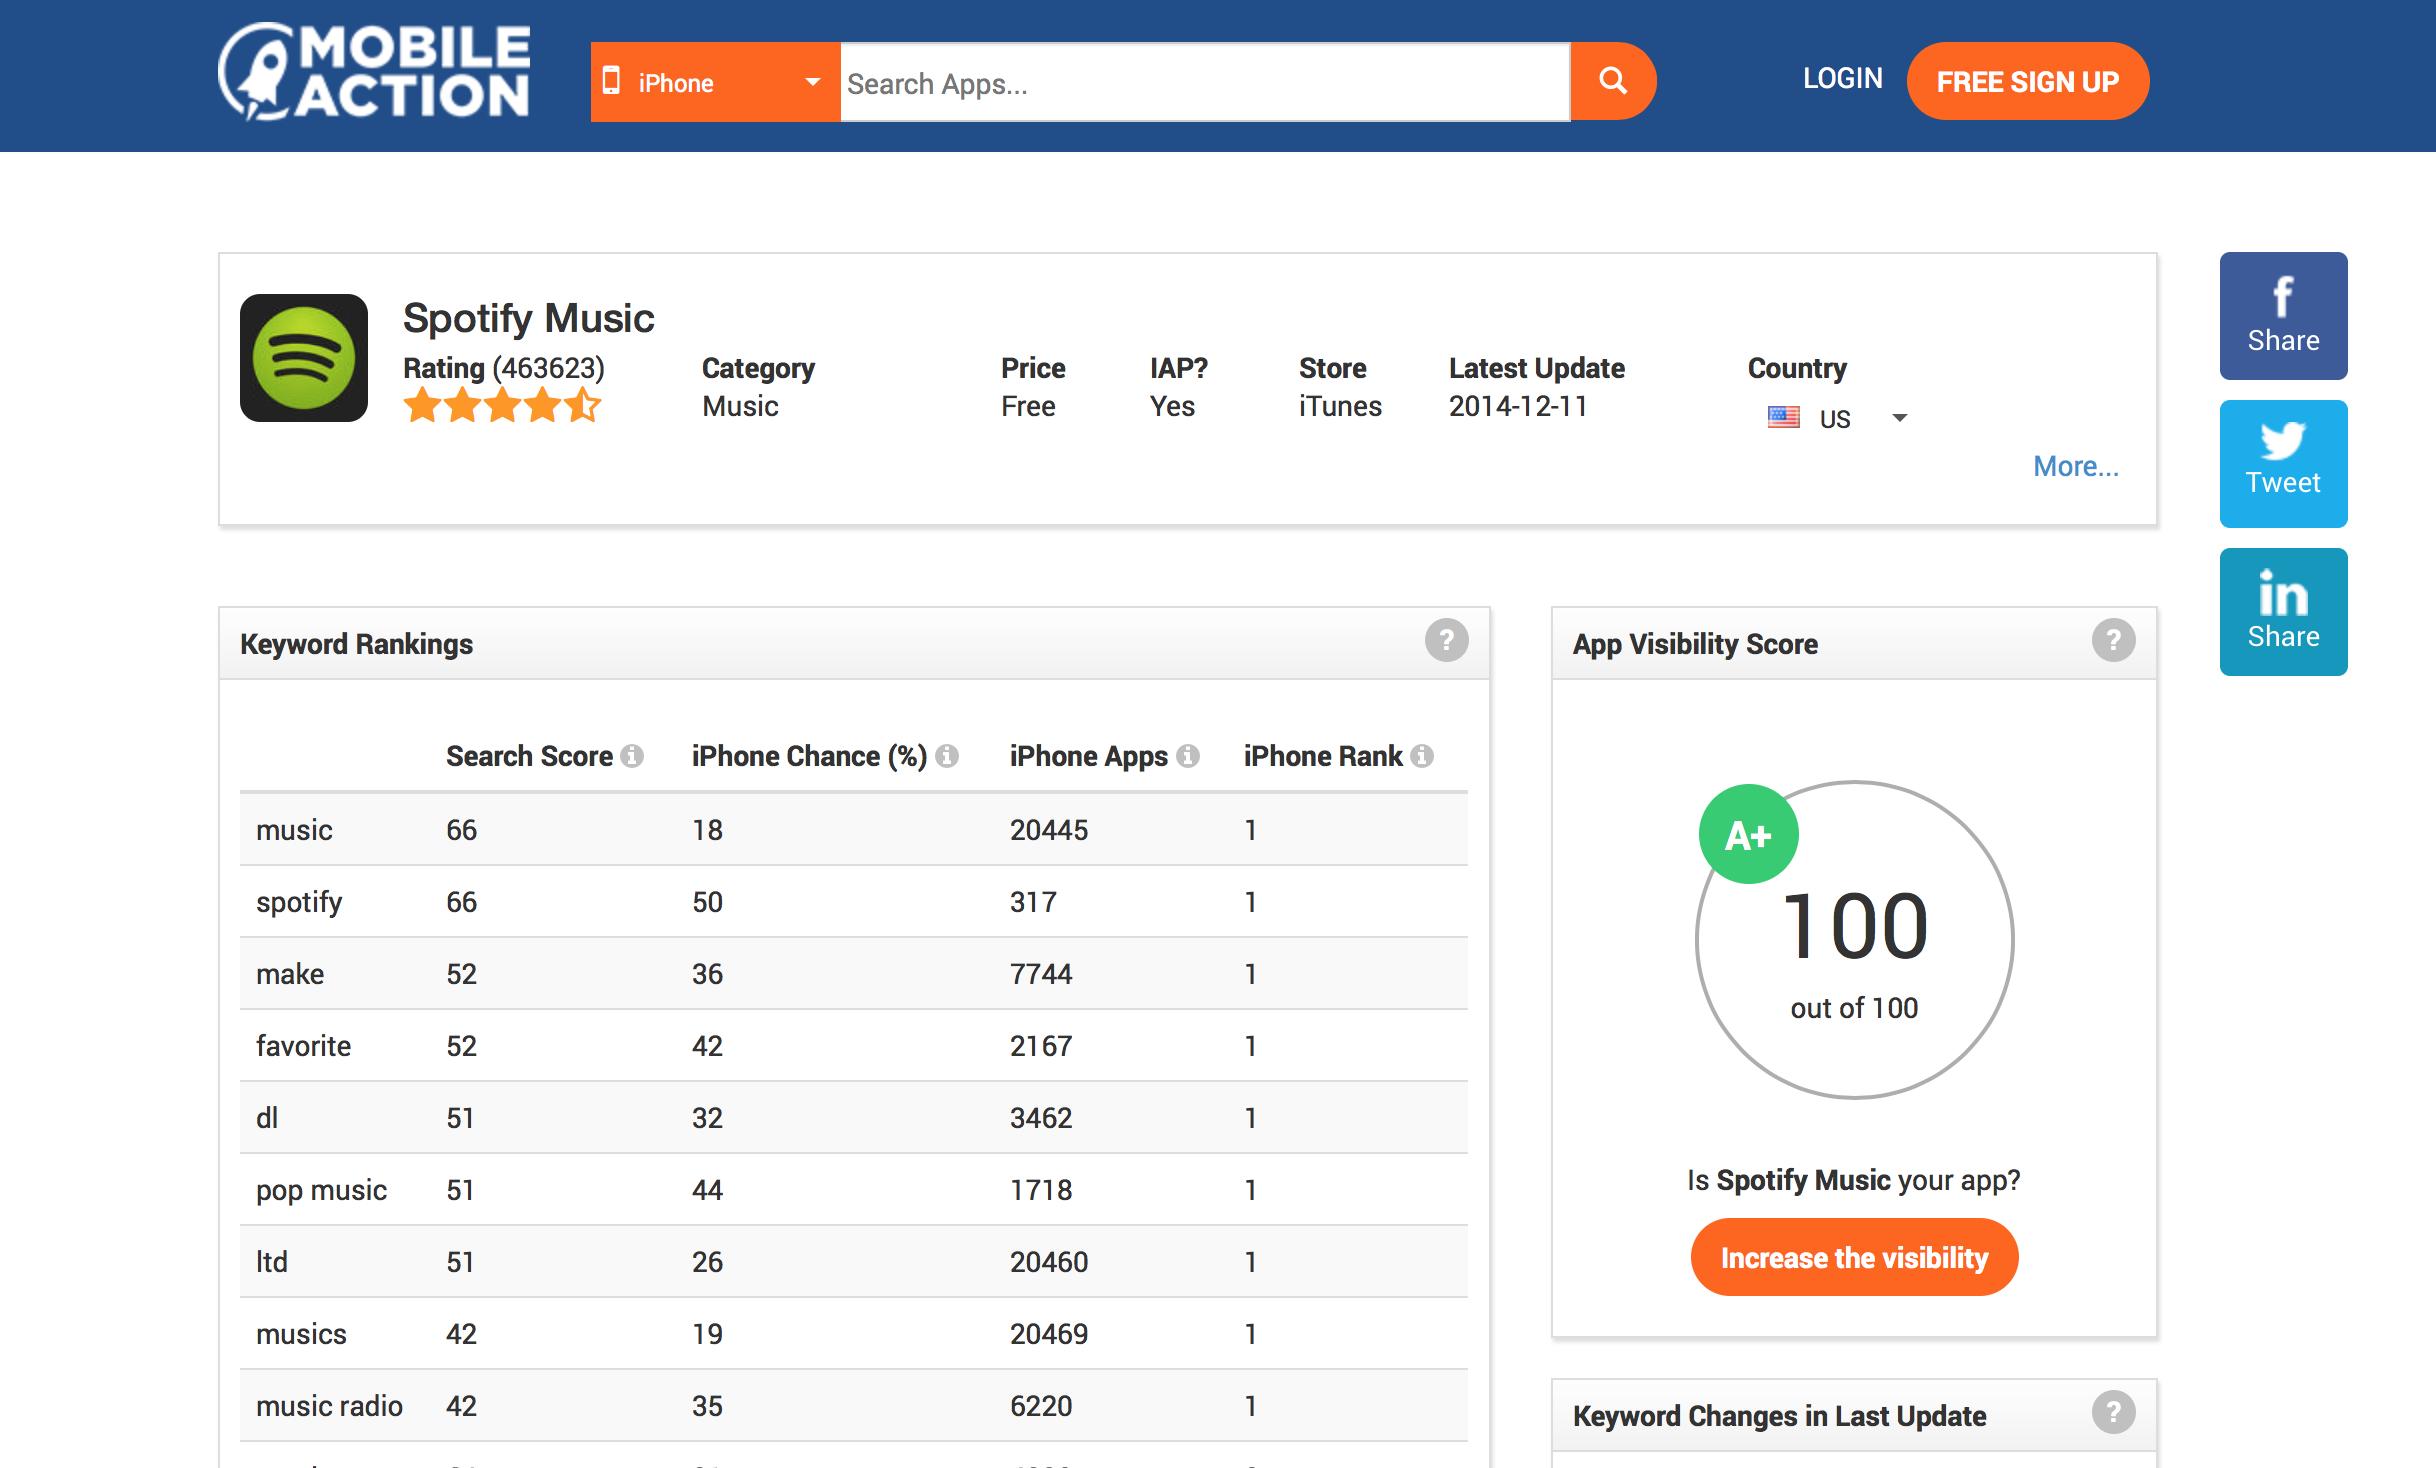 Spotify Music App Store Ranking, Reviews, Keyword Ranking